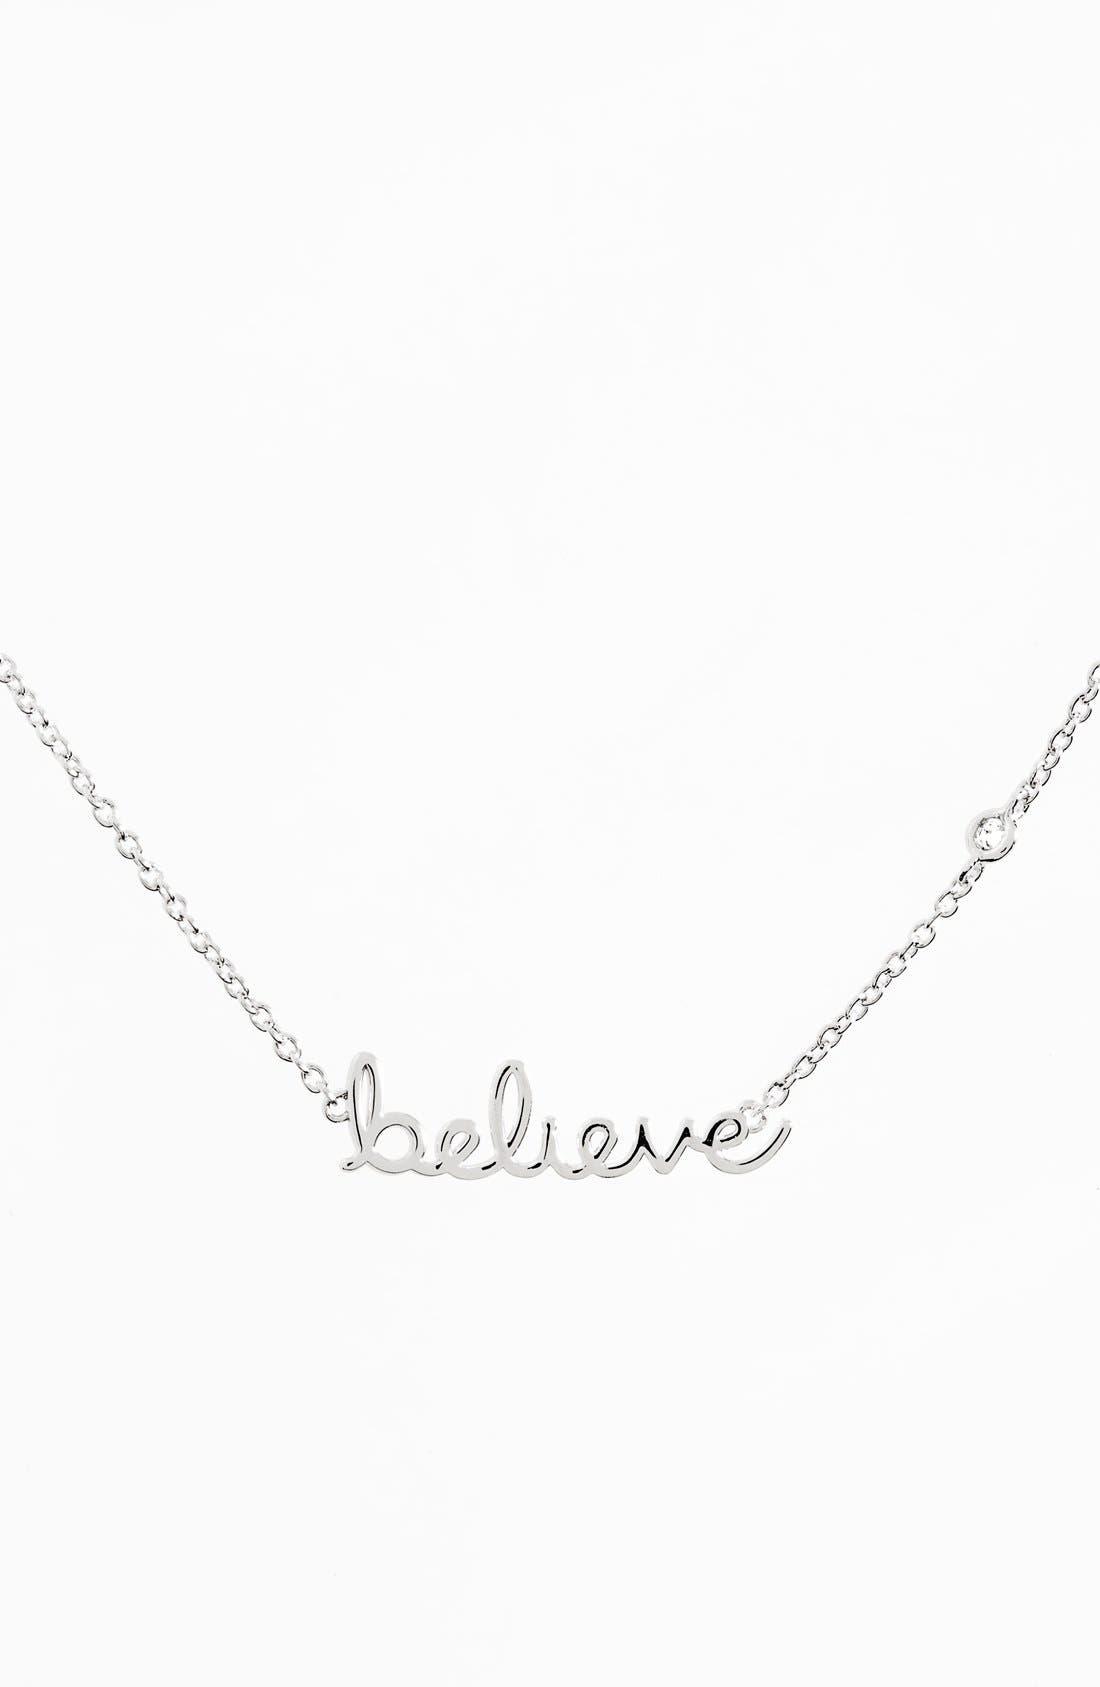 'Believe' Necklace,                         Main,                         color, Silver